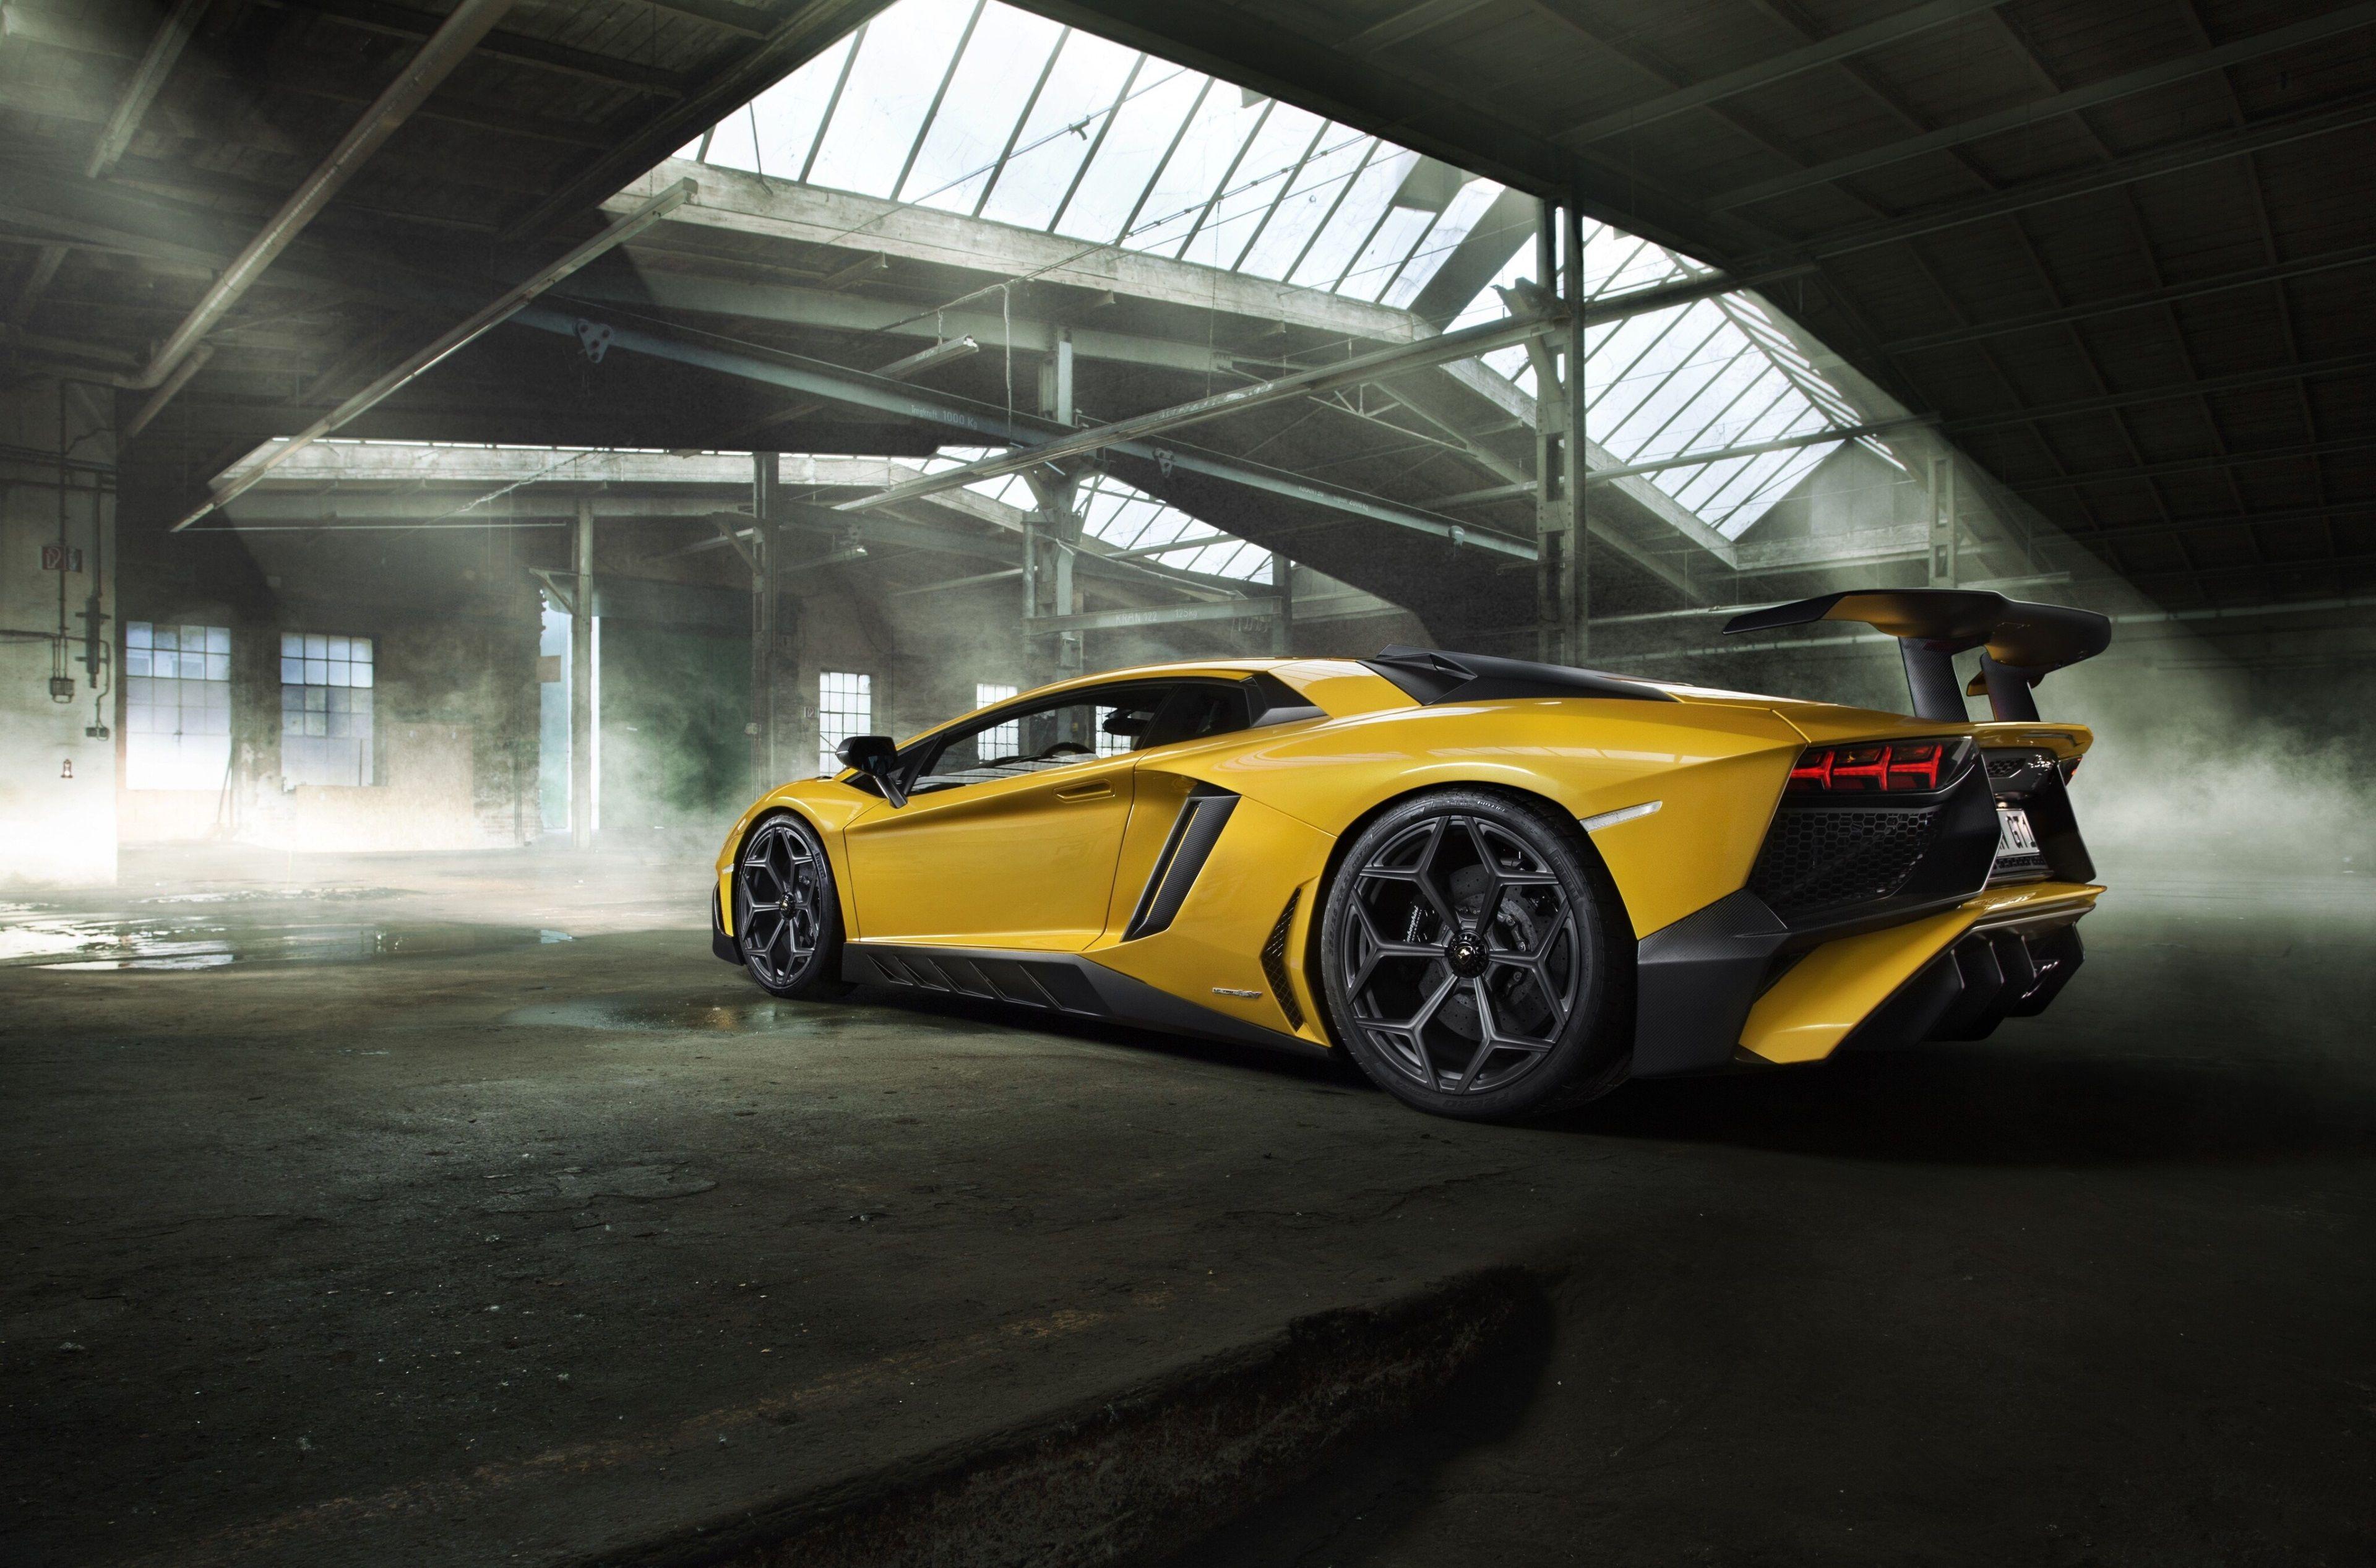 3840x2534 Lamborghini Aventador Lp 750 4 Superveloce 4k Pc Hd Wallpaper Download Car Wallpapers Lamborghini Aventador Sports Cars Lamborghini